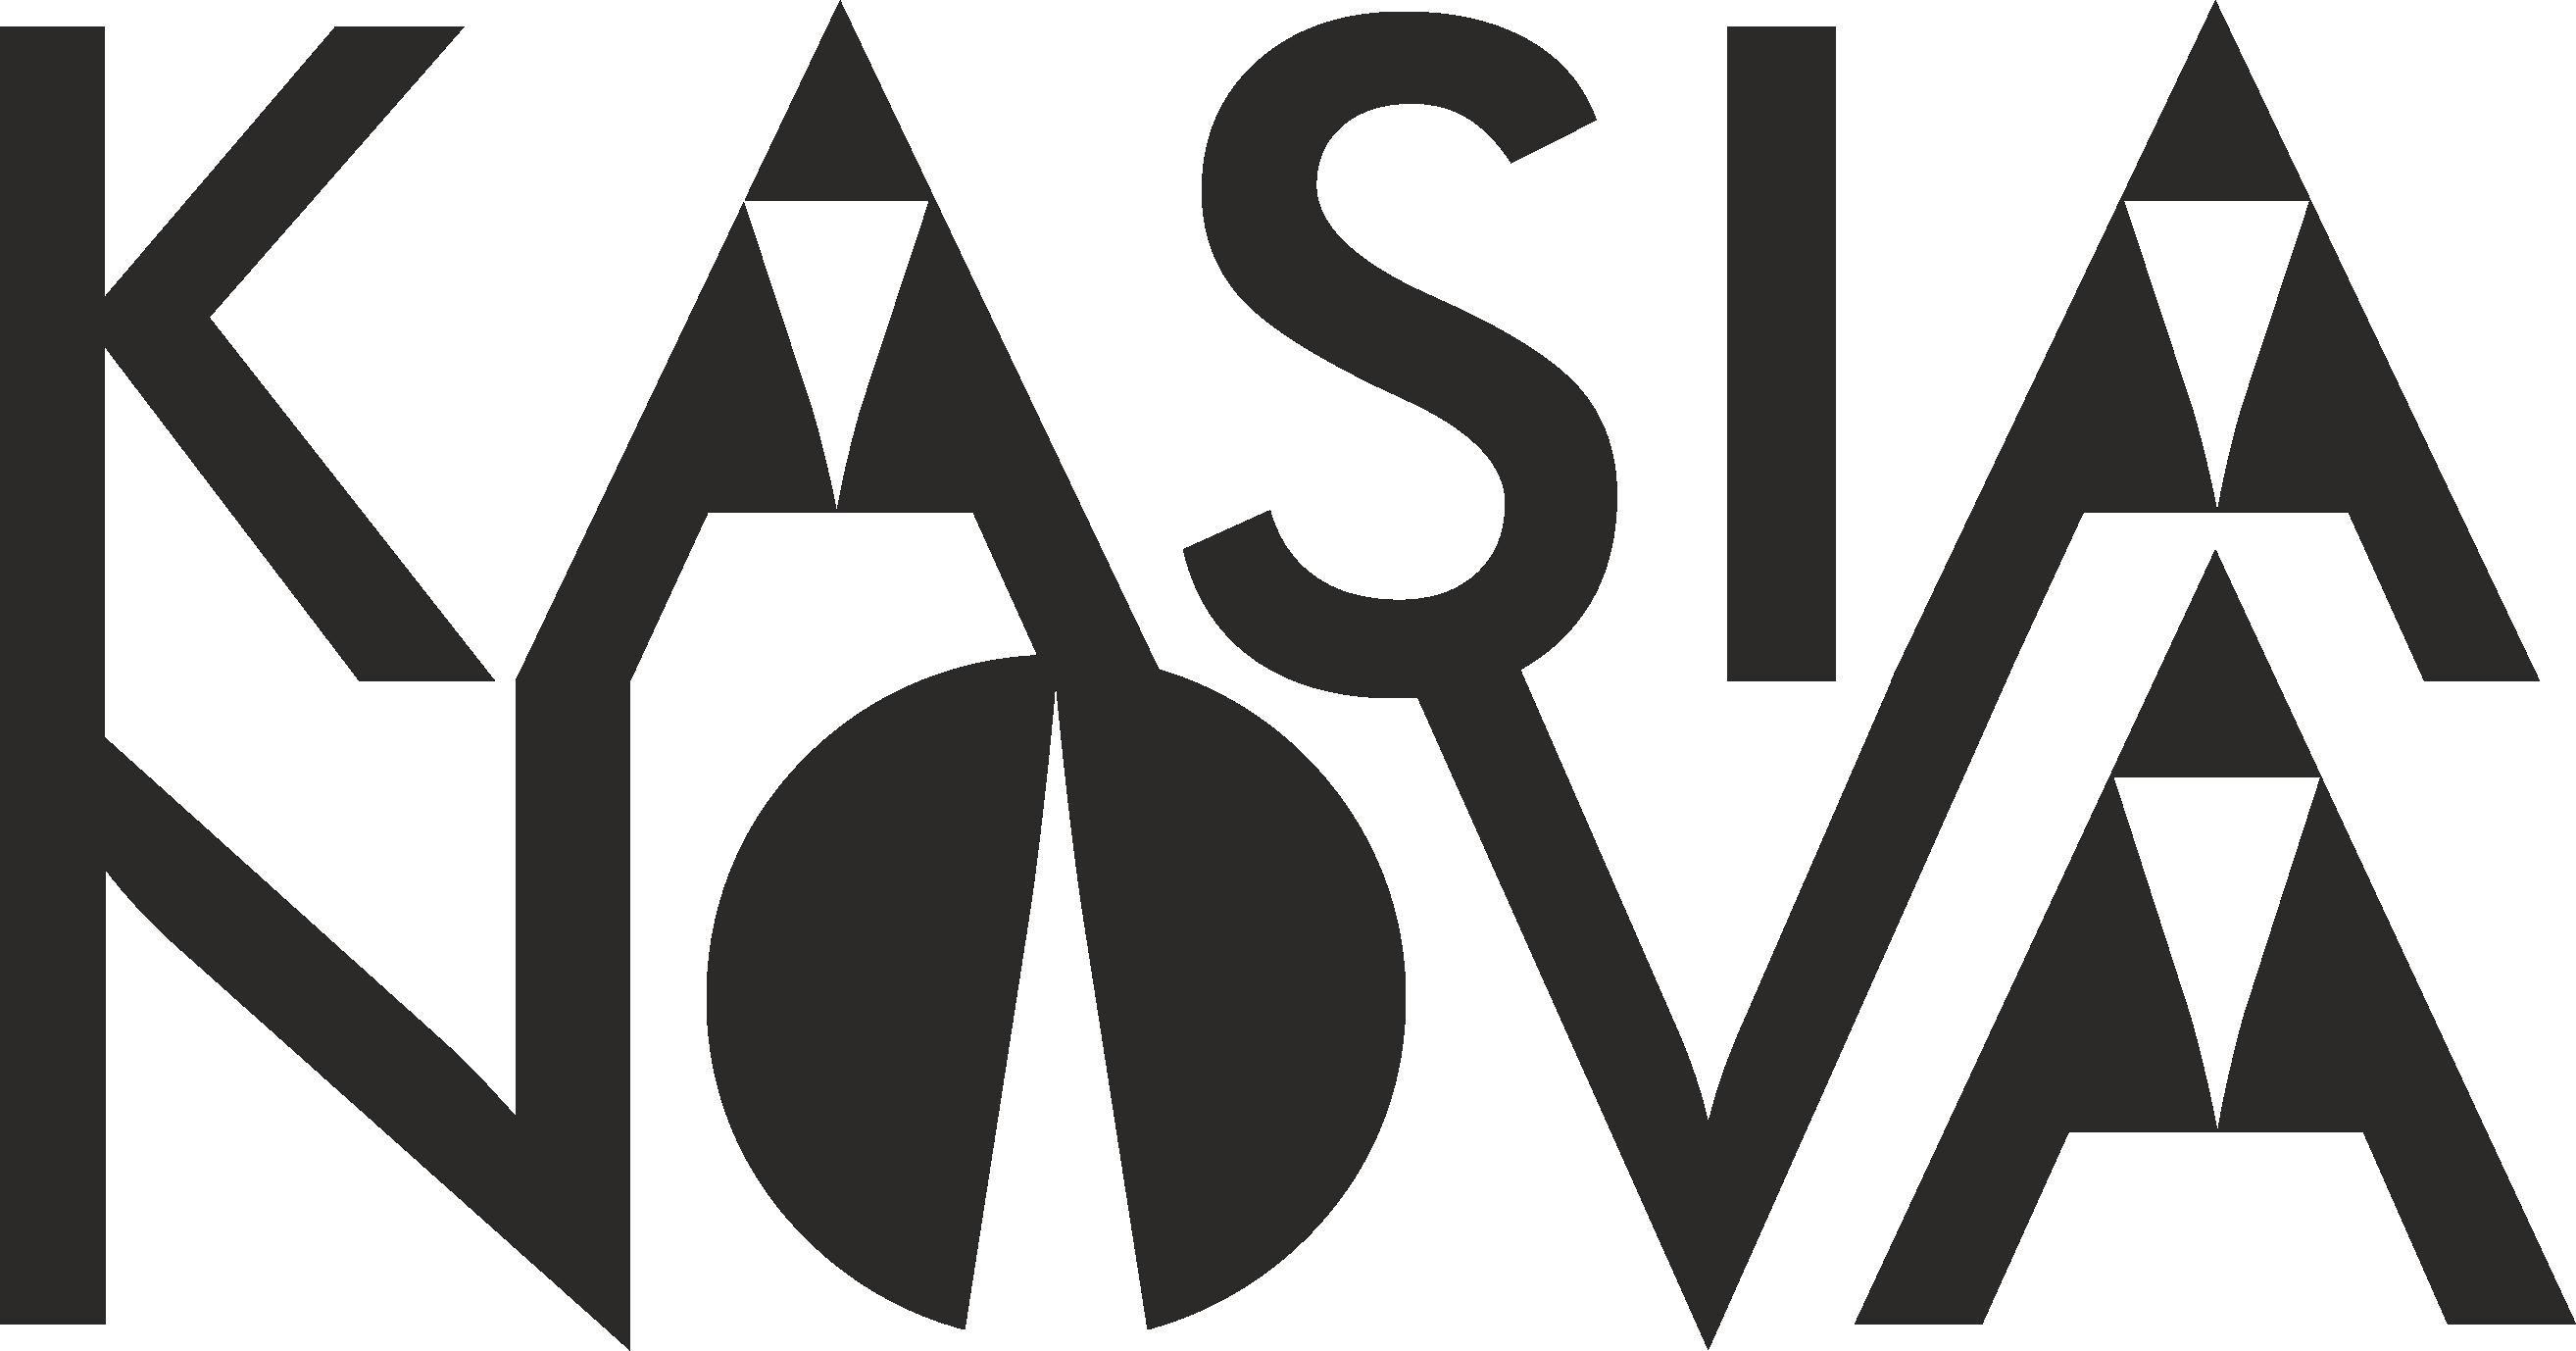 Kasia Nova